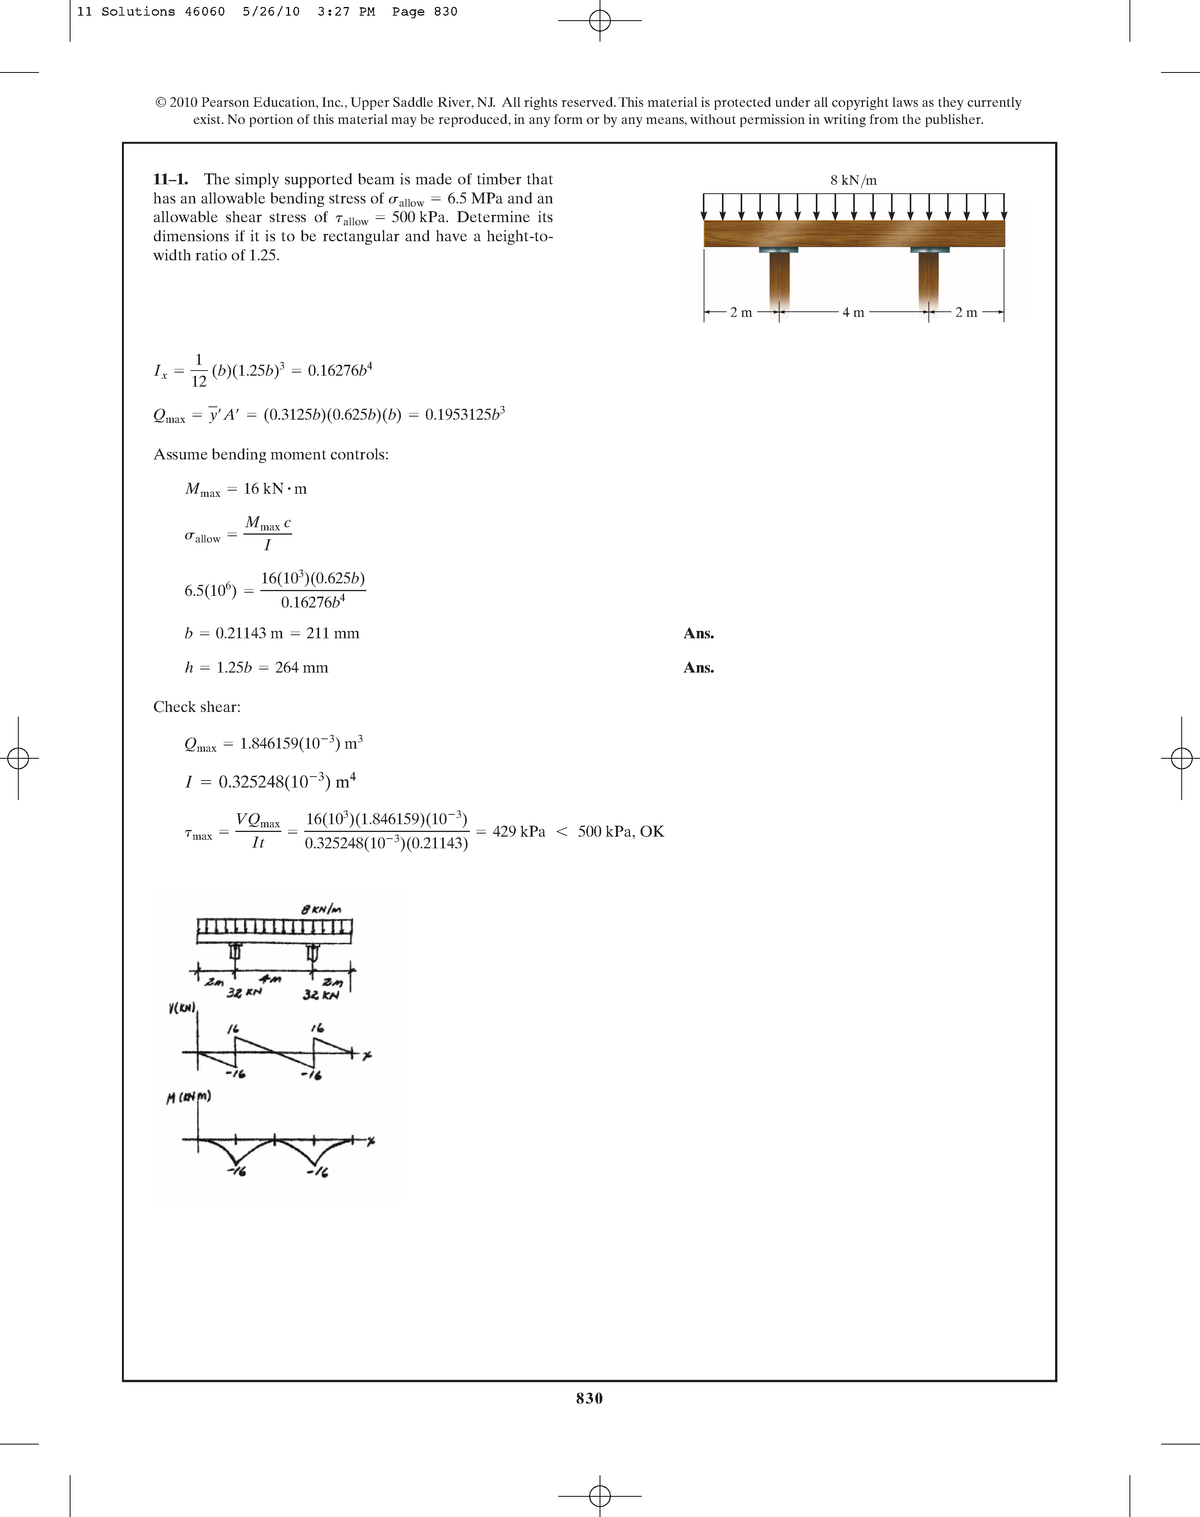 Chapter 11 - Solution manual Mechanics of Materials - FM 15